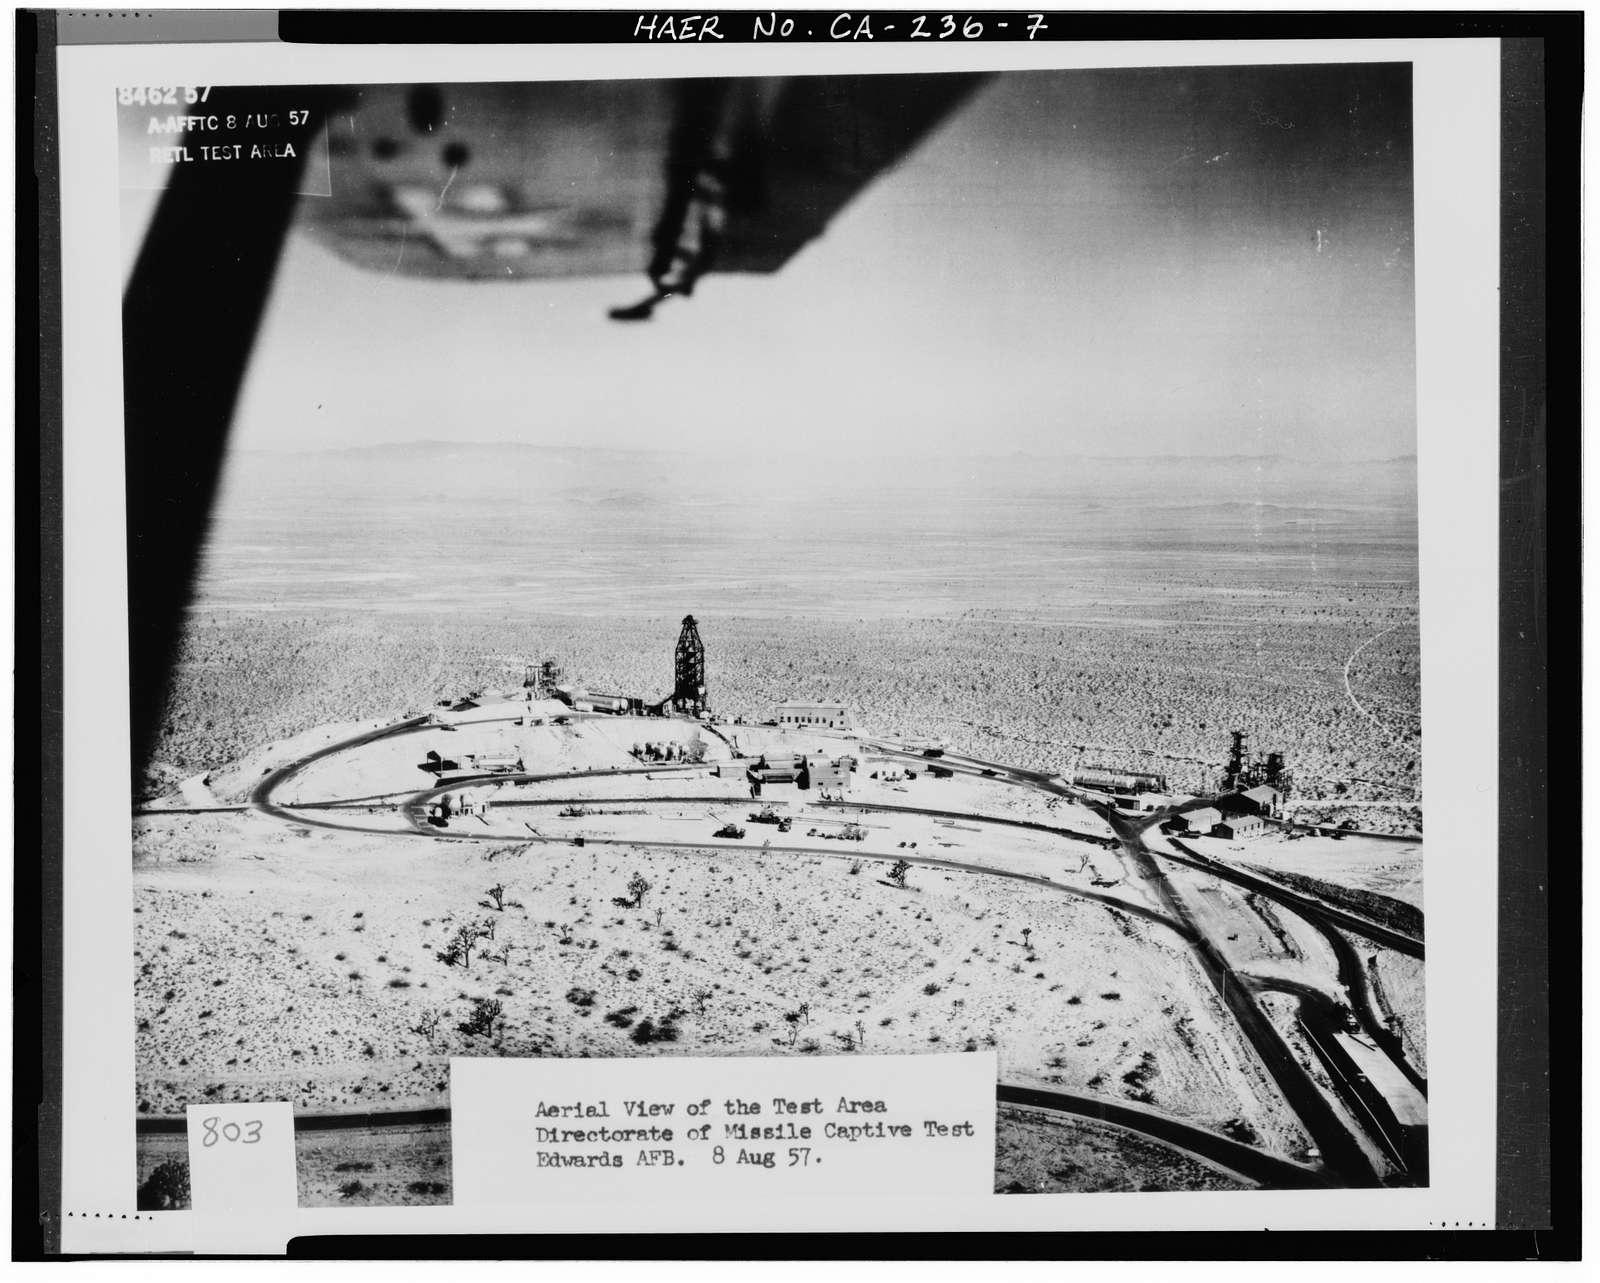 Edwards Air Force Base, Air Force Rocket Propulsion Laboratory, Leuhman Ridge near Highways 58 & 395, Boron, Kern County, CA